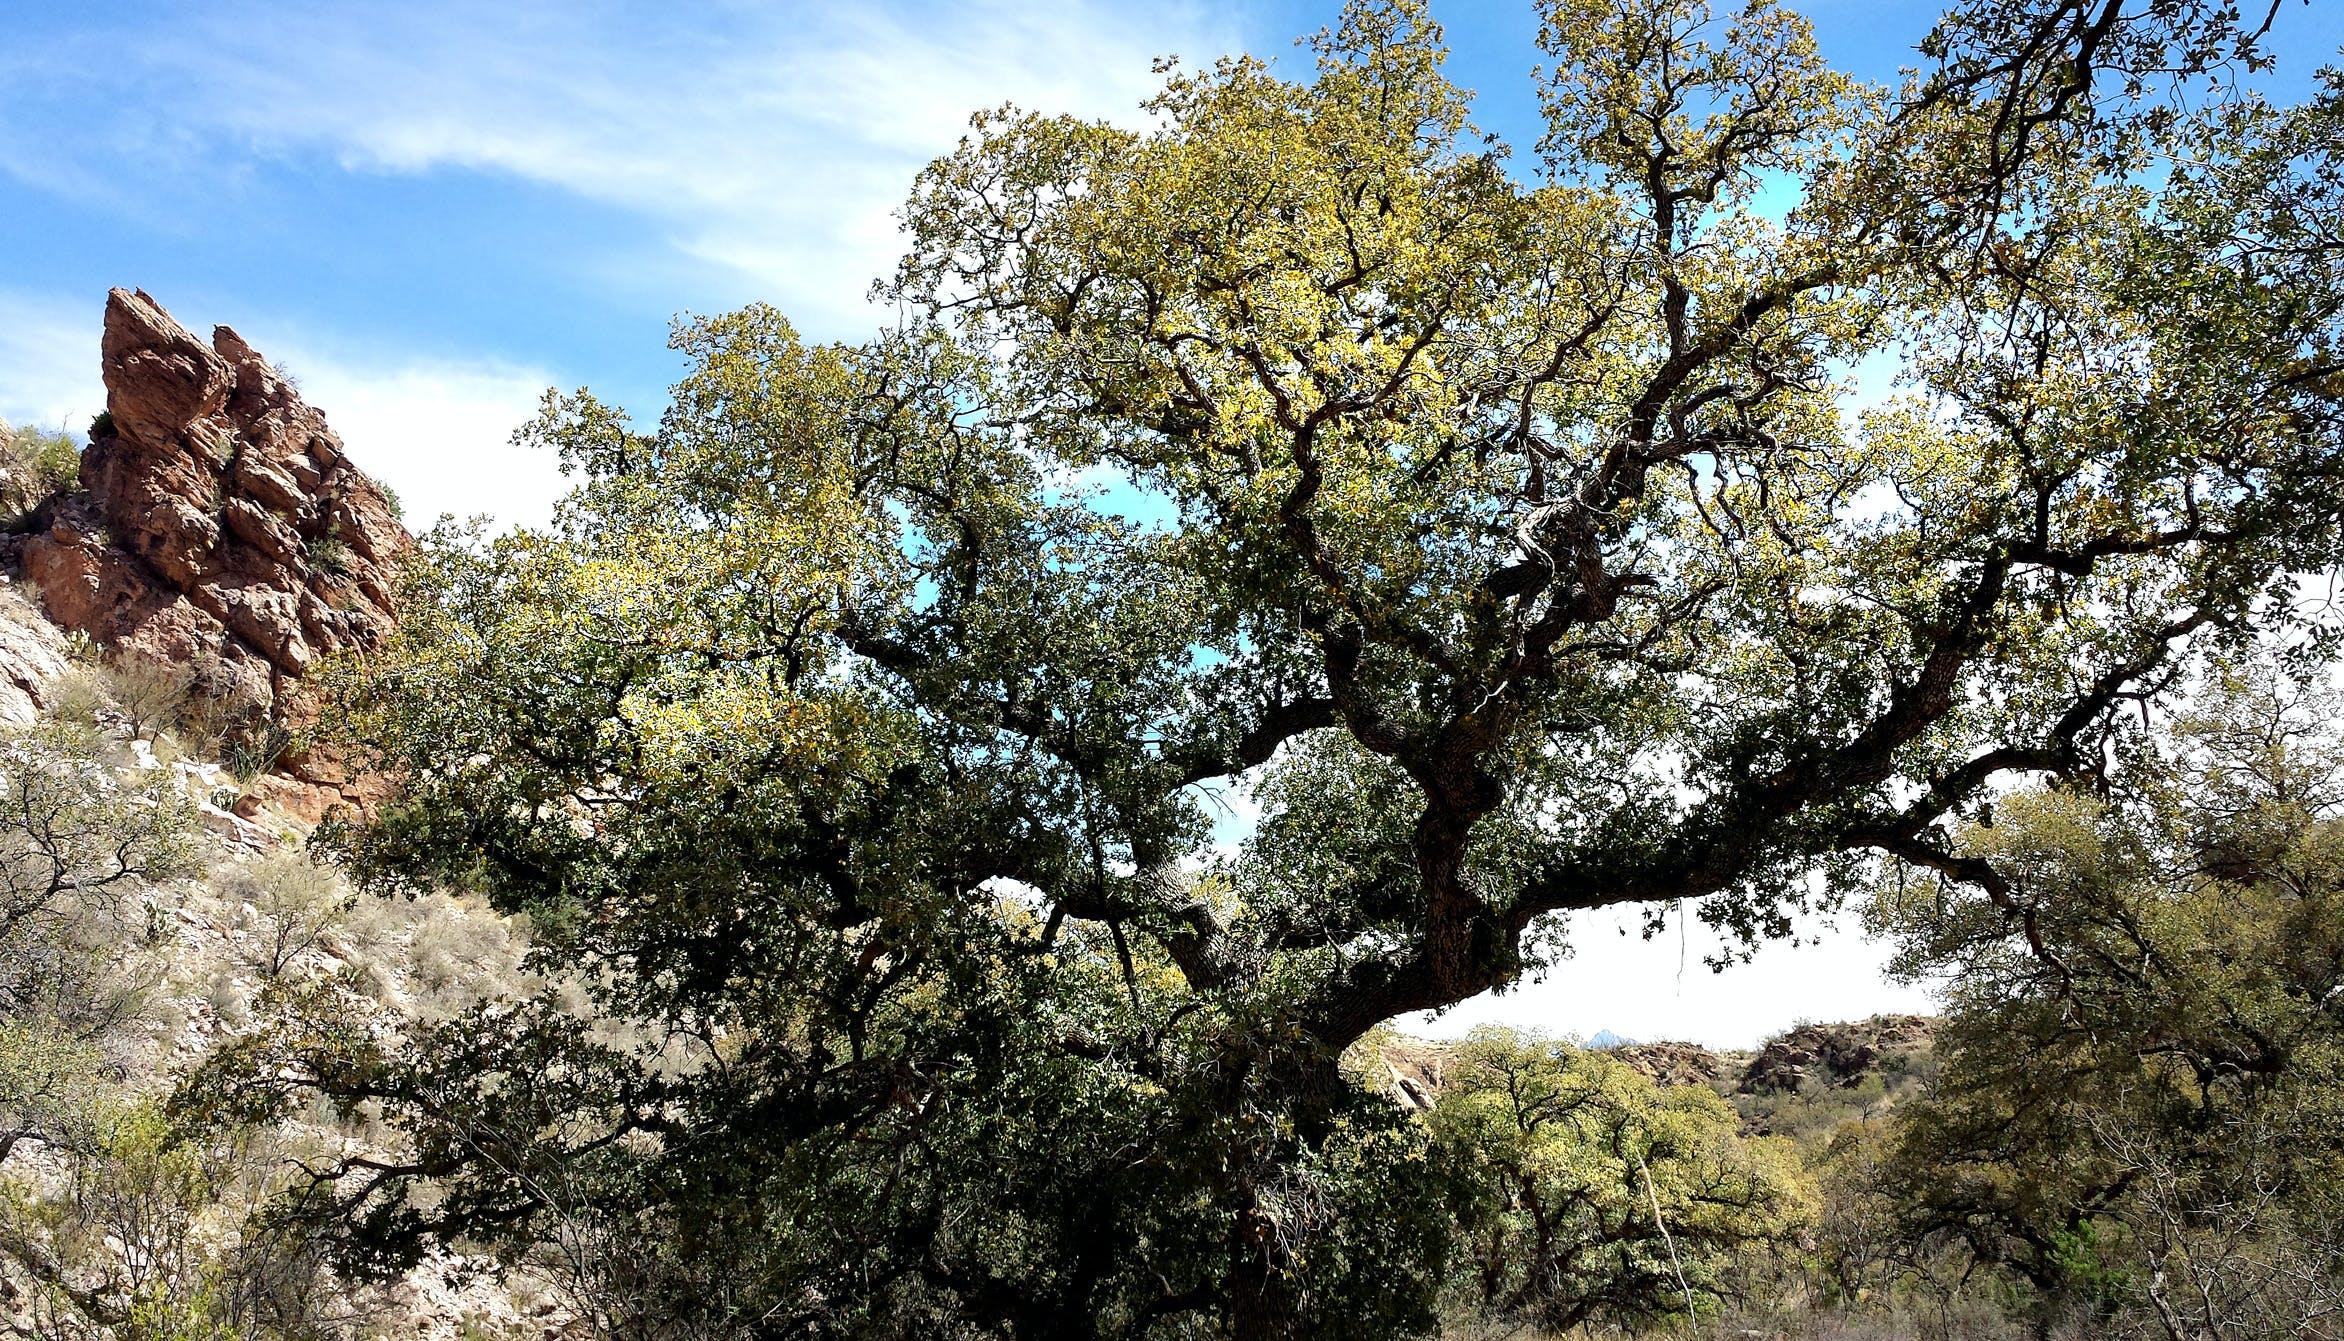 Kostenloses Stock Foto zu äste, bäume, landschaft, natur